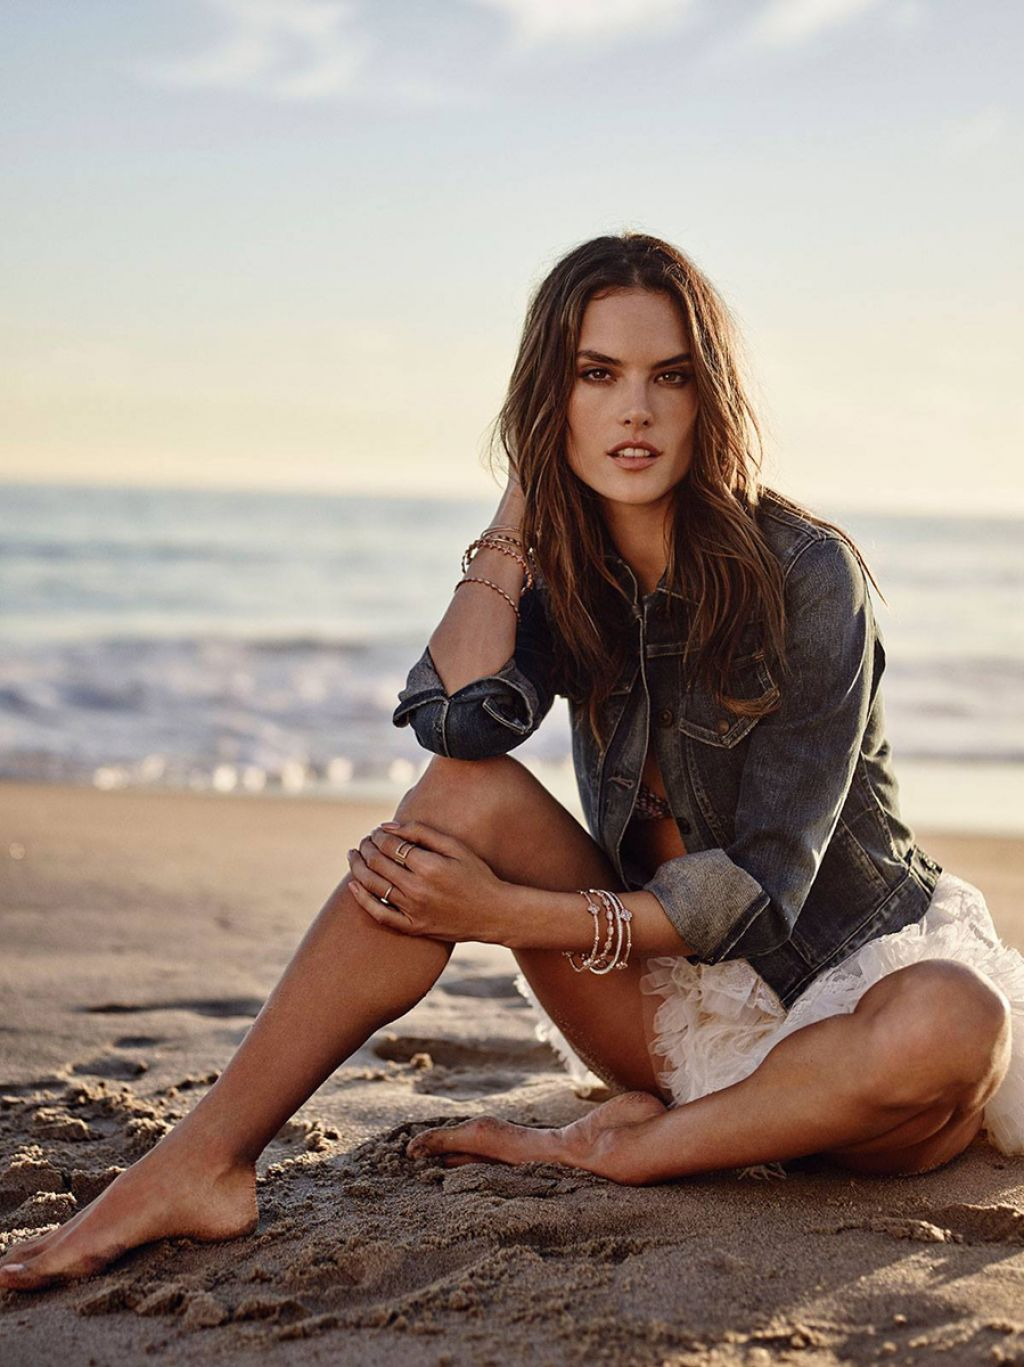 Alessandra Ambrosio Shows Off Her Bikini Body - Malibu, CA